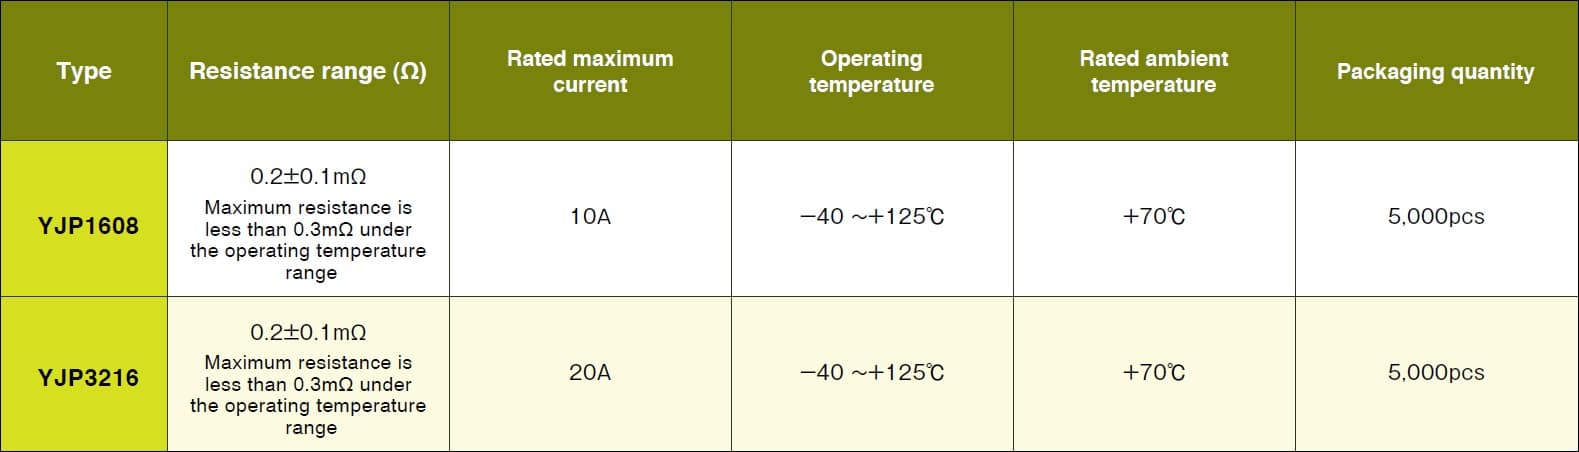 Susumu YJP3216 Specifications